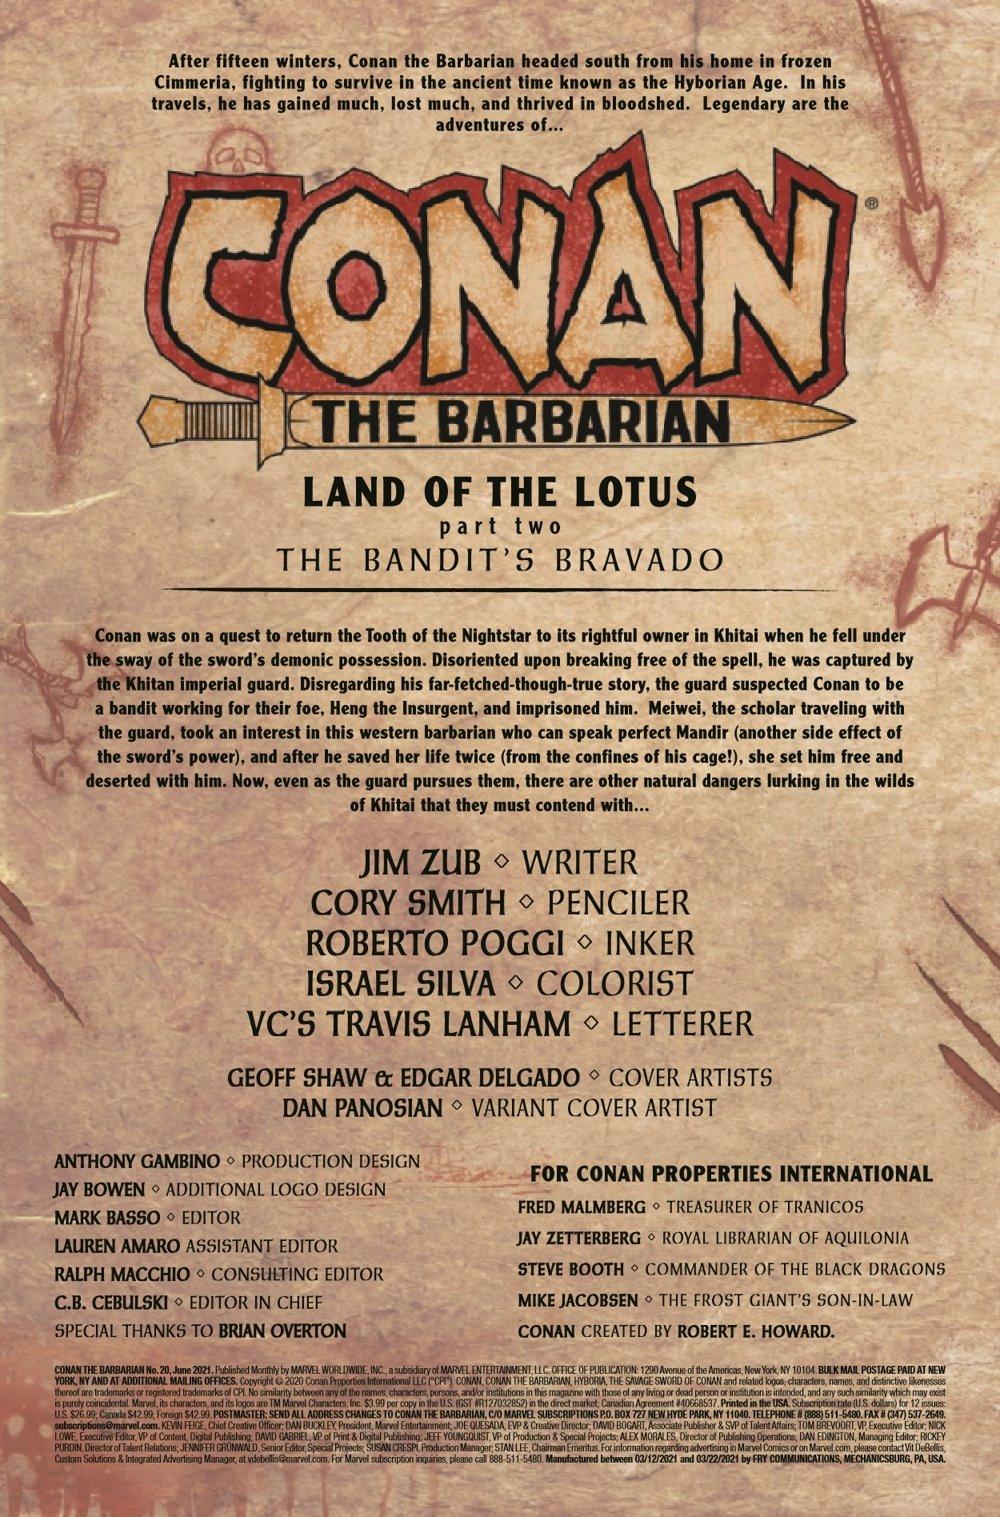 CONANBARB2019020_Preview-2 ComicList Previews: CONAN THE BARBARIAN #20